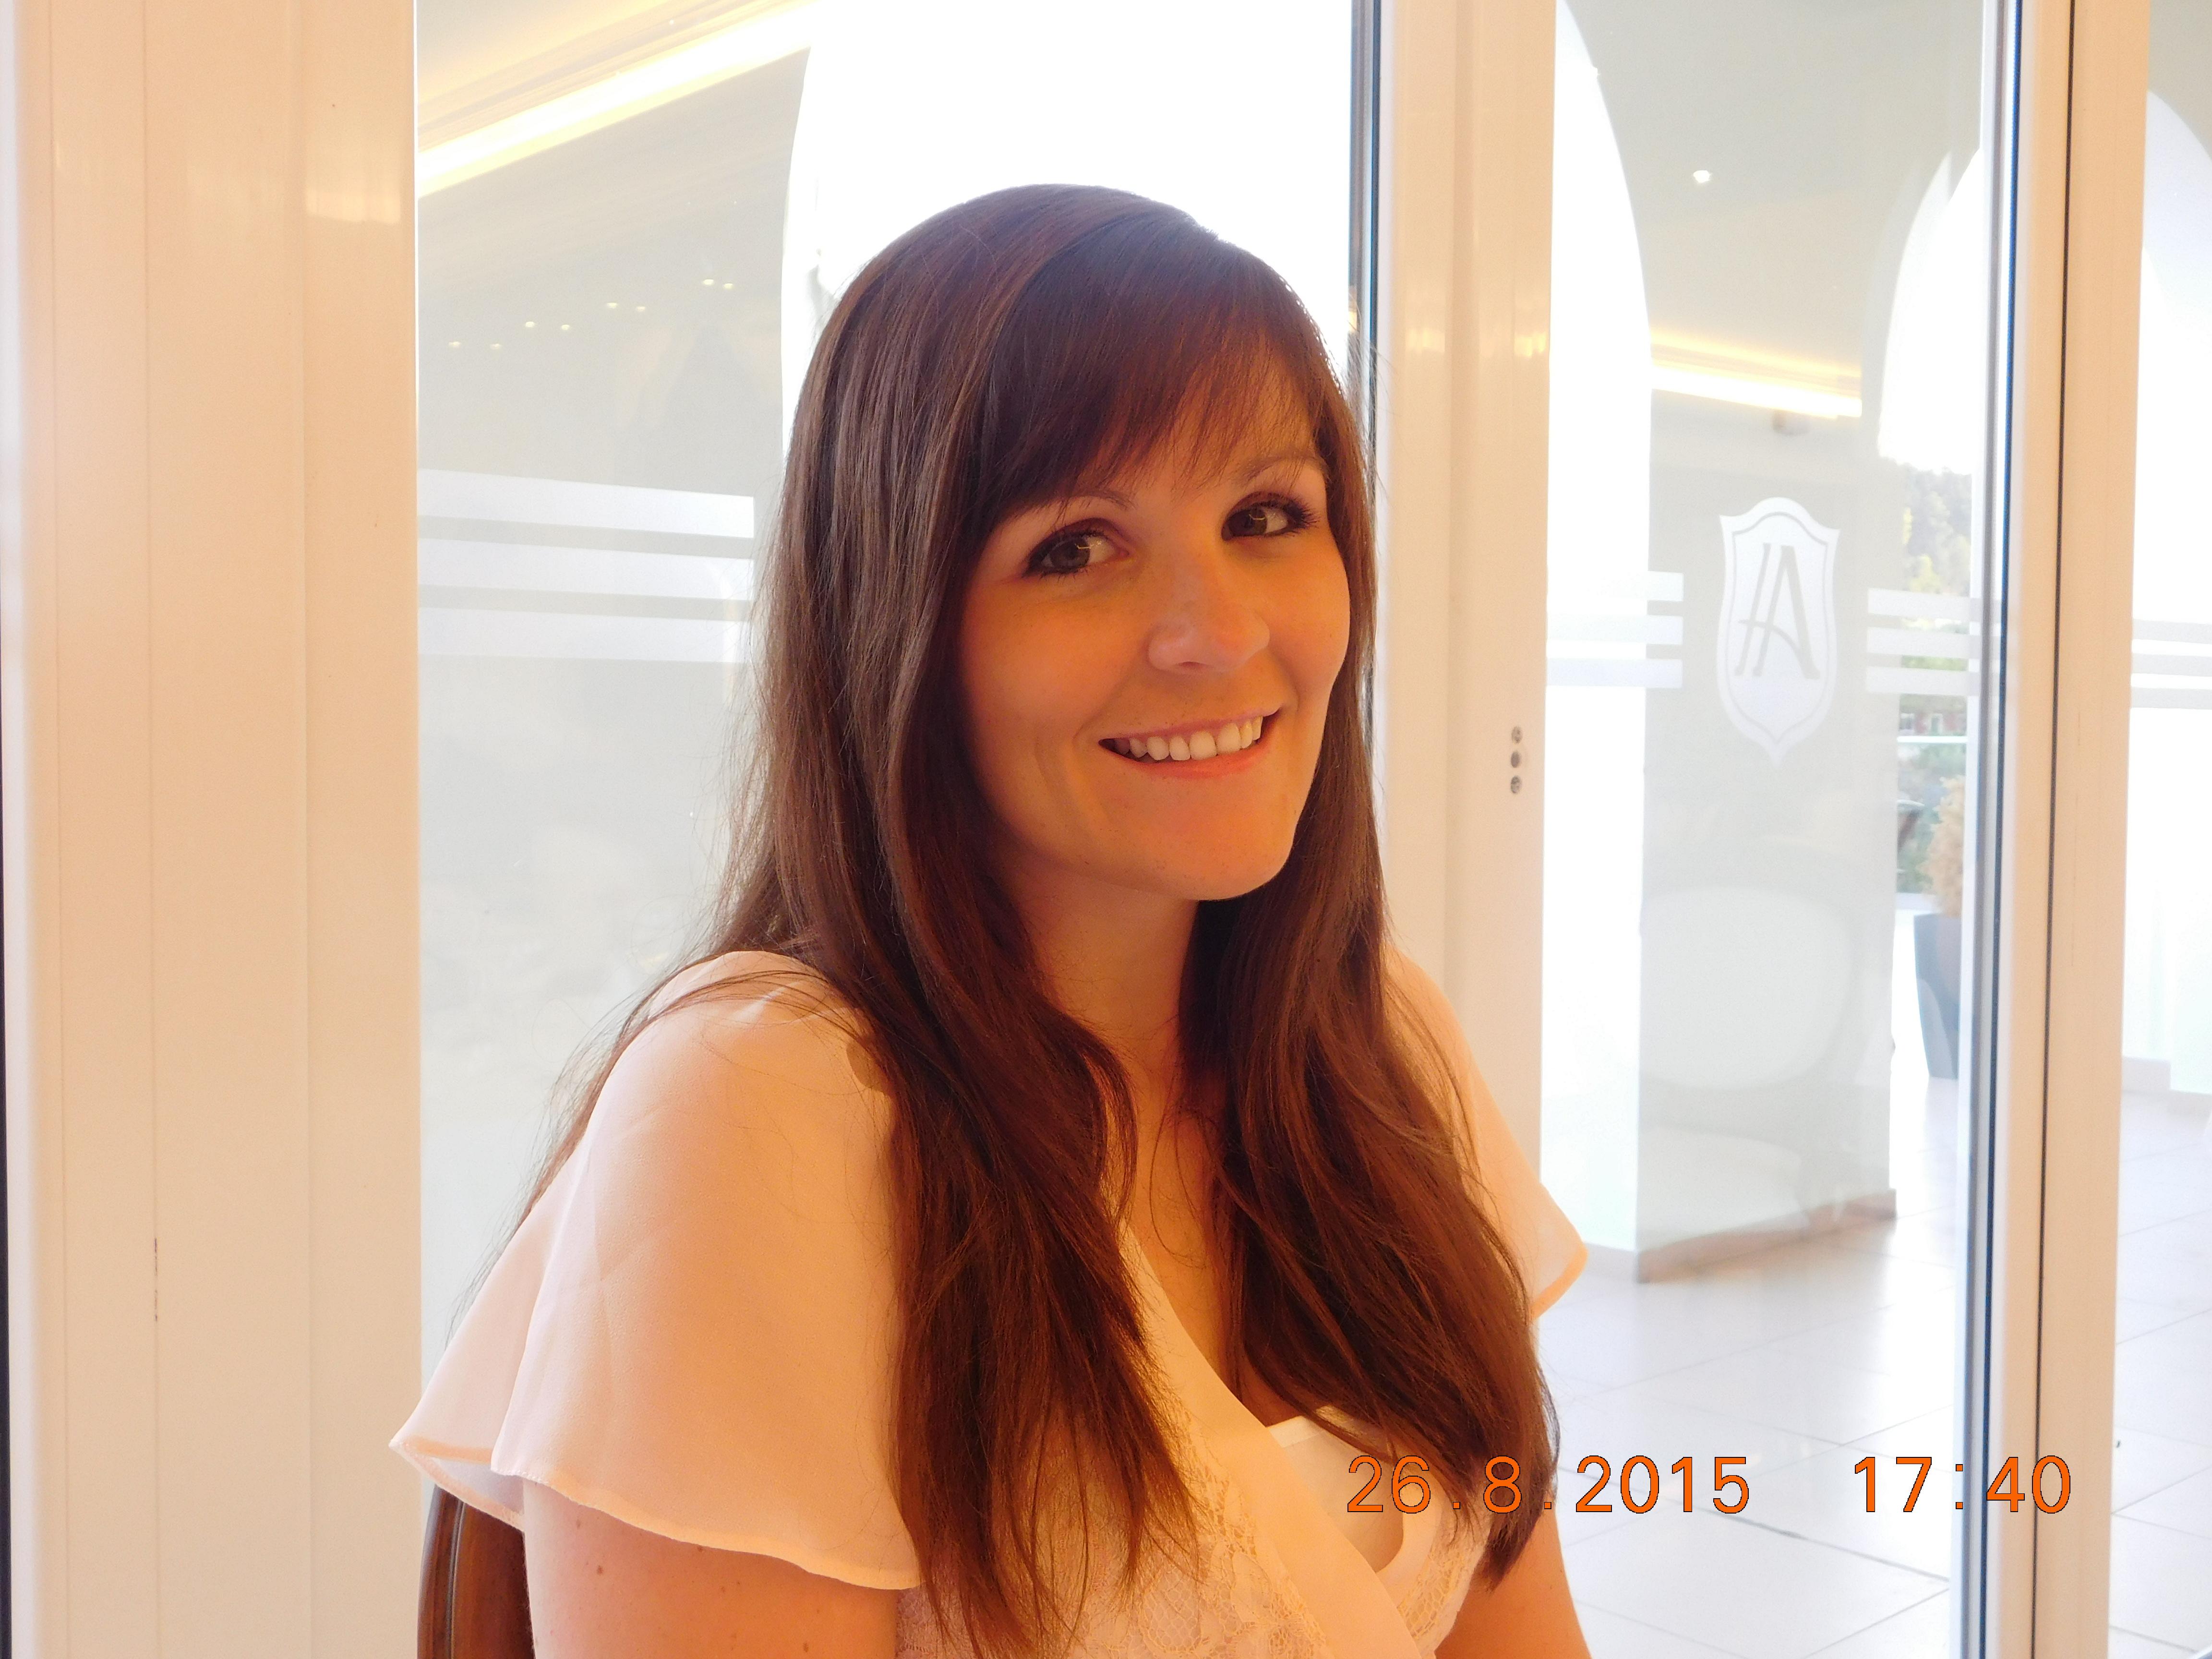 Miss Siobhan Tutor